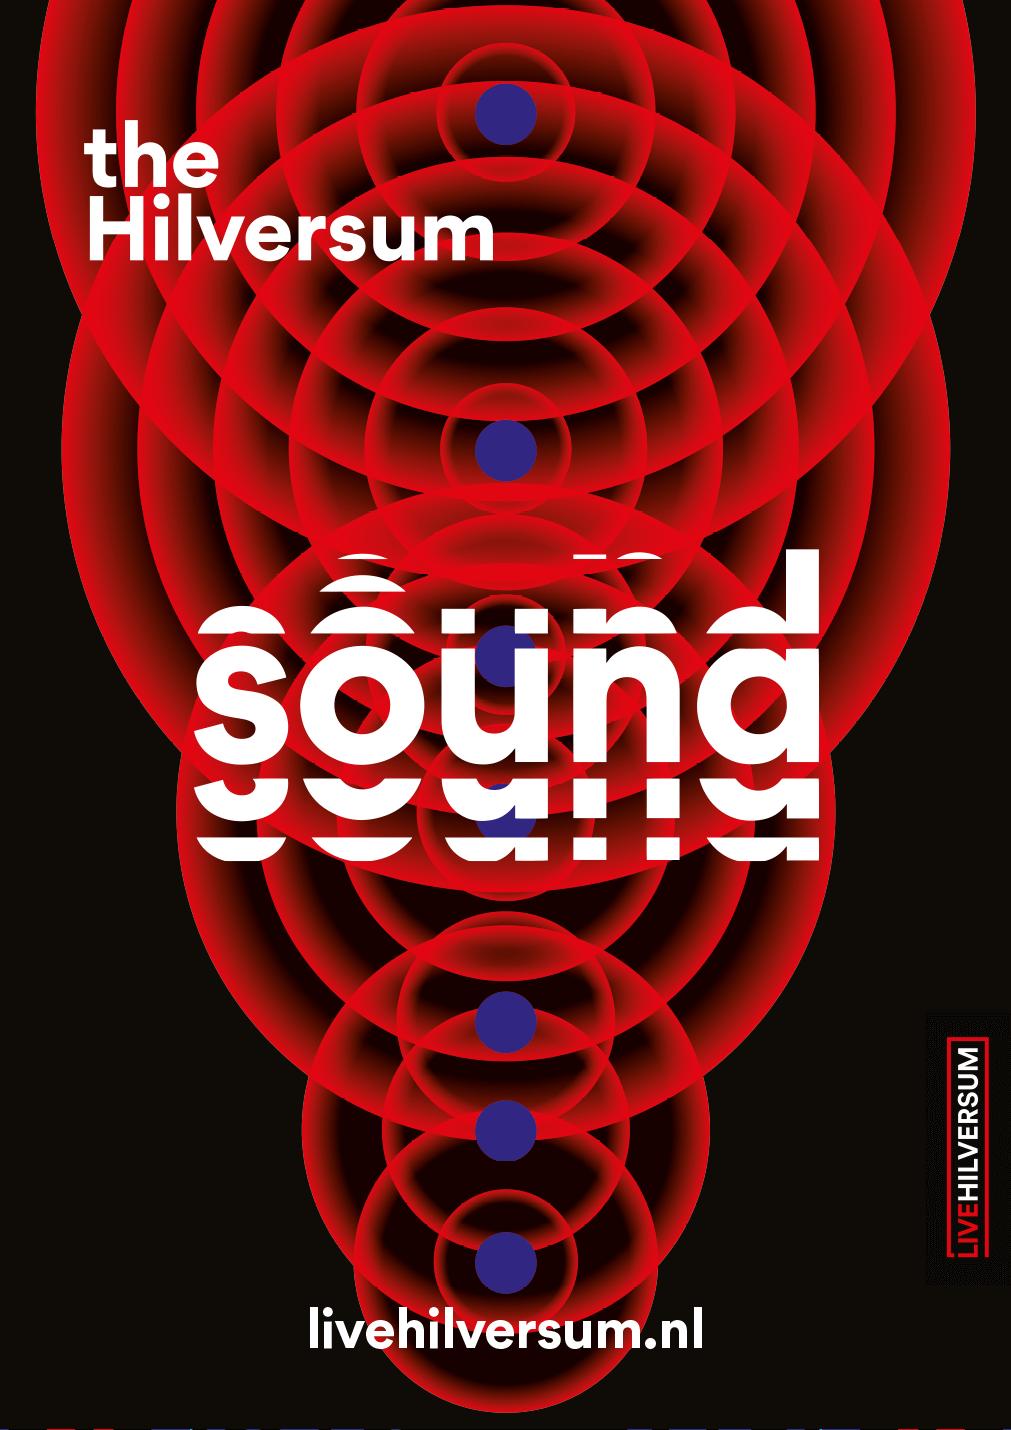 TheHilversumSound_2